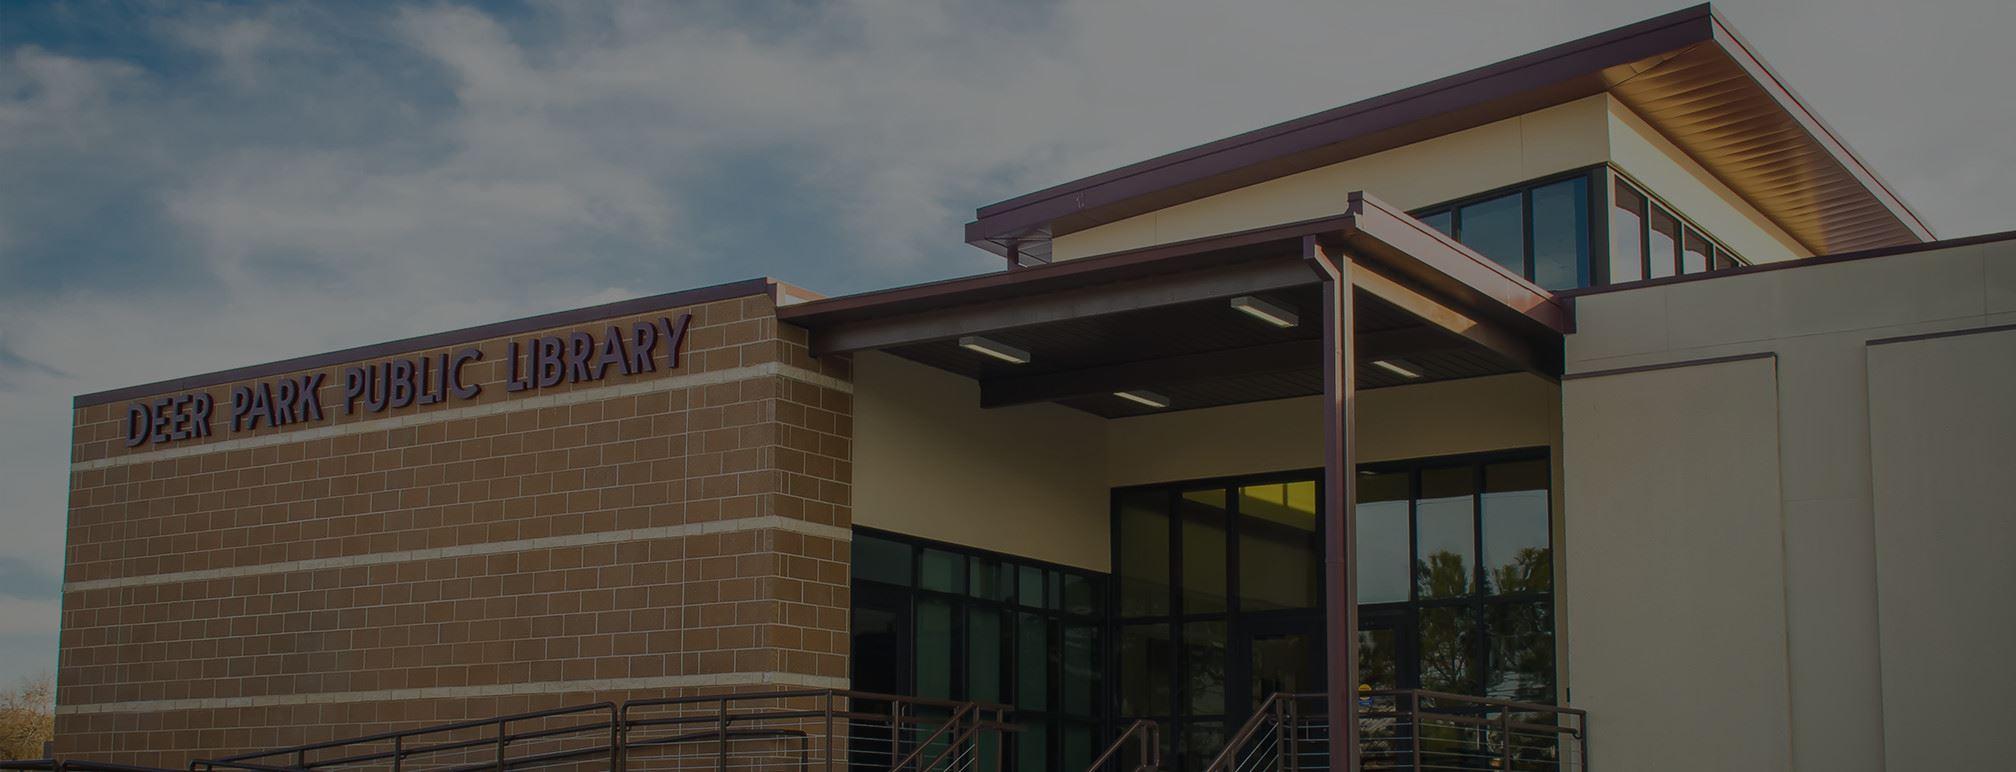 Your Library Online | Deer Park, TX - Official Website